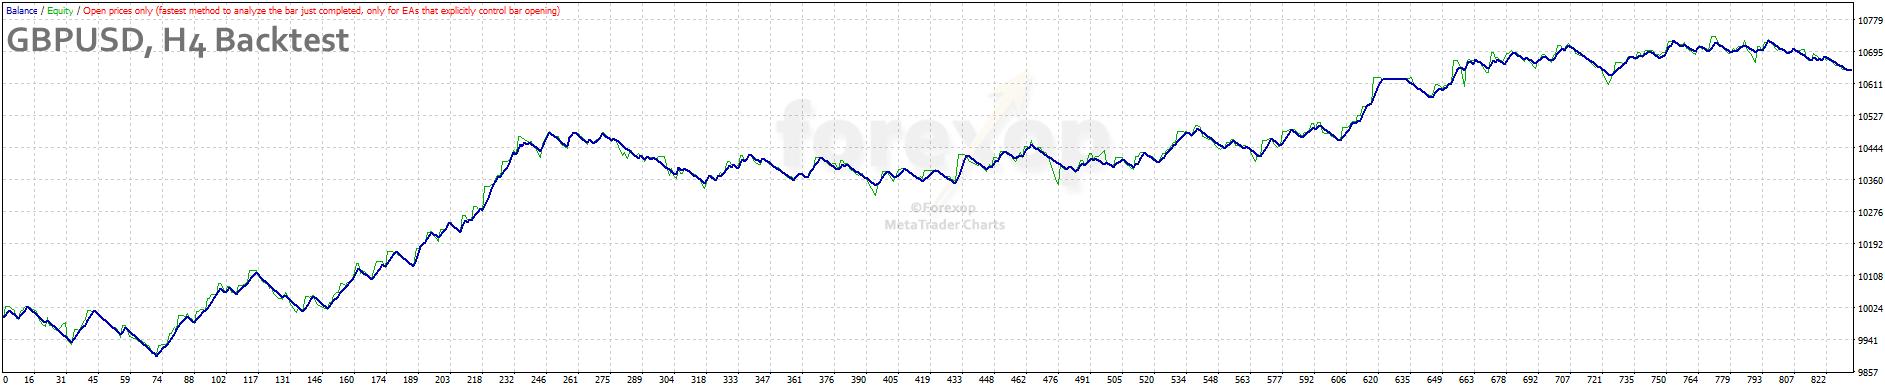 Figure 5: GBPUSD, four hour chart back test